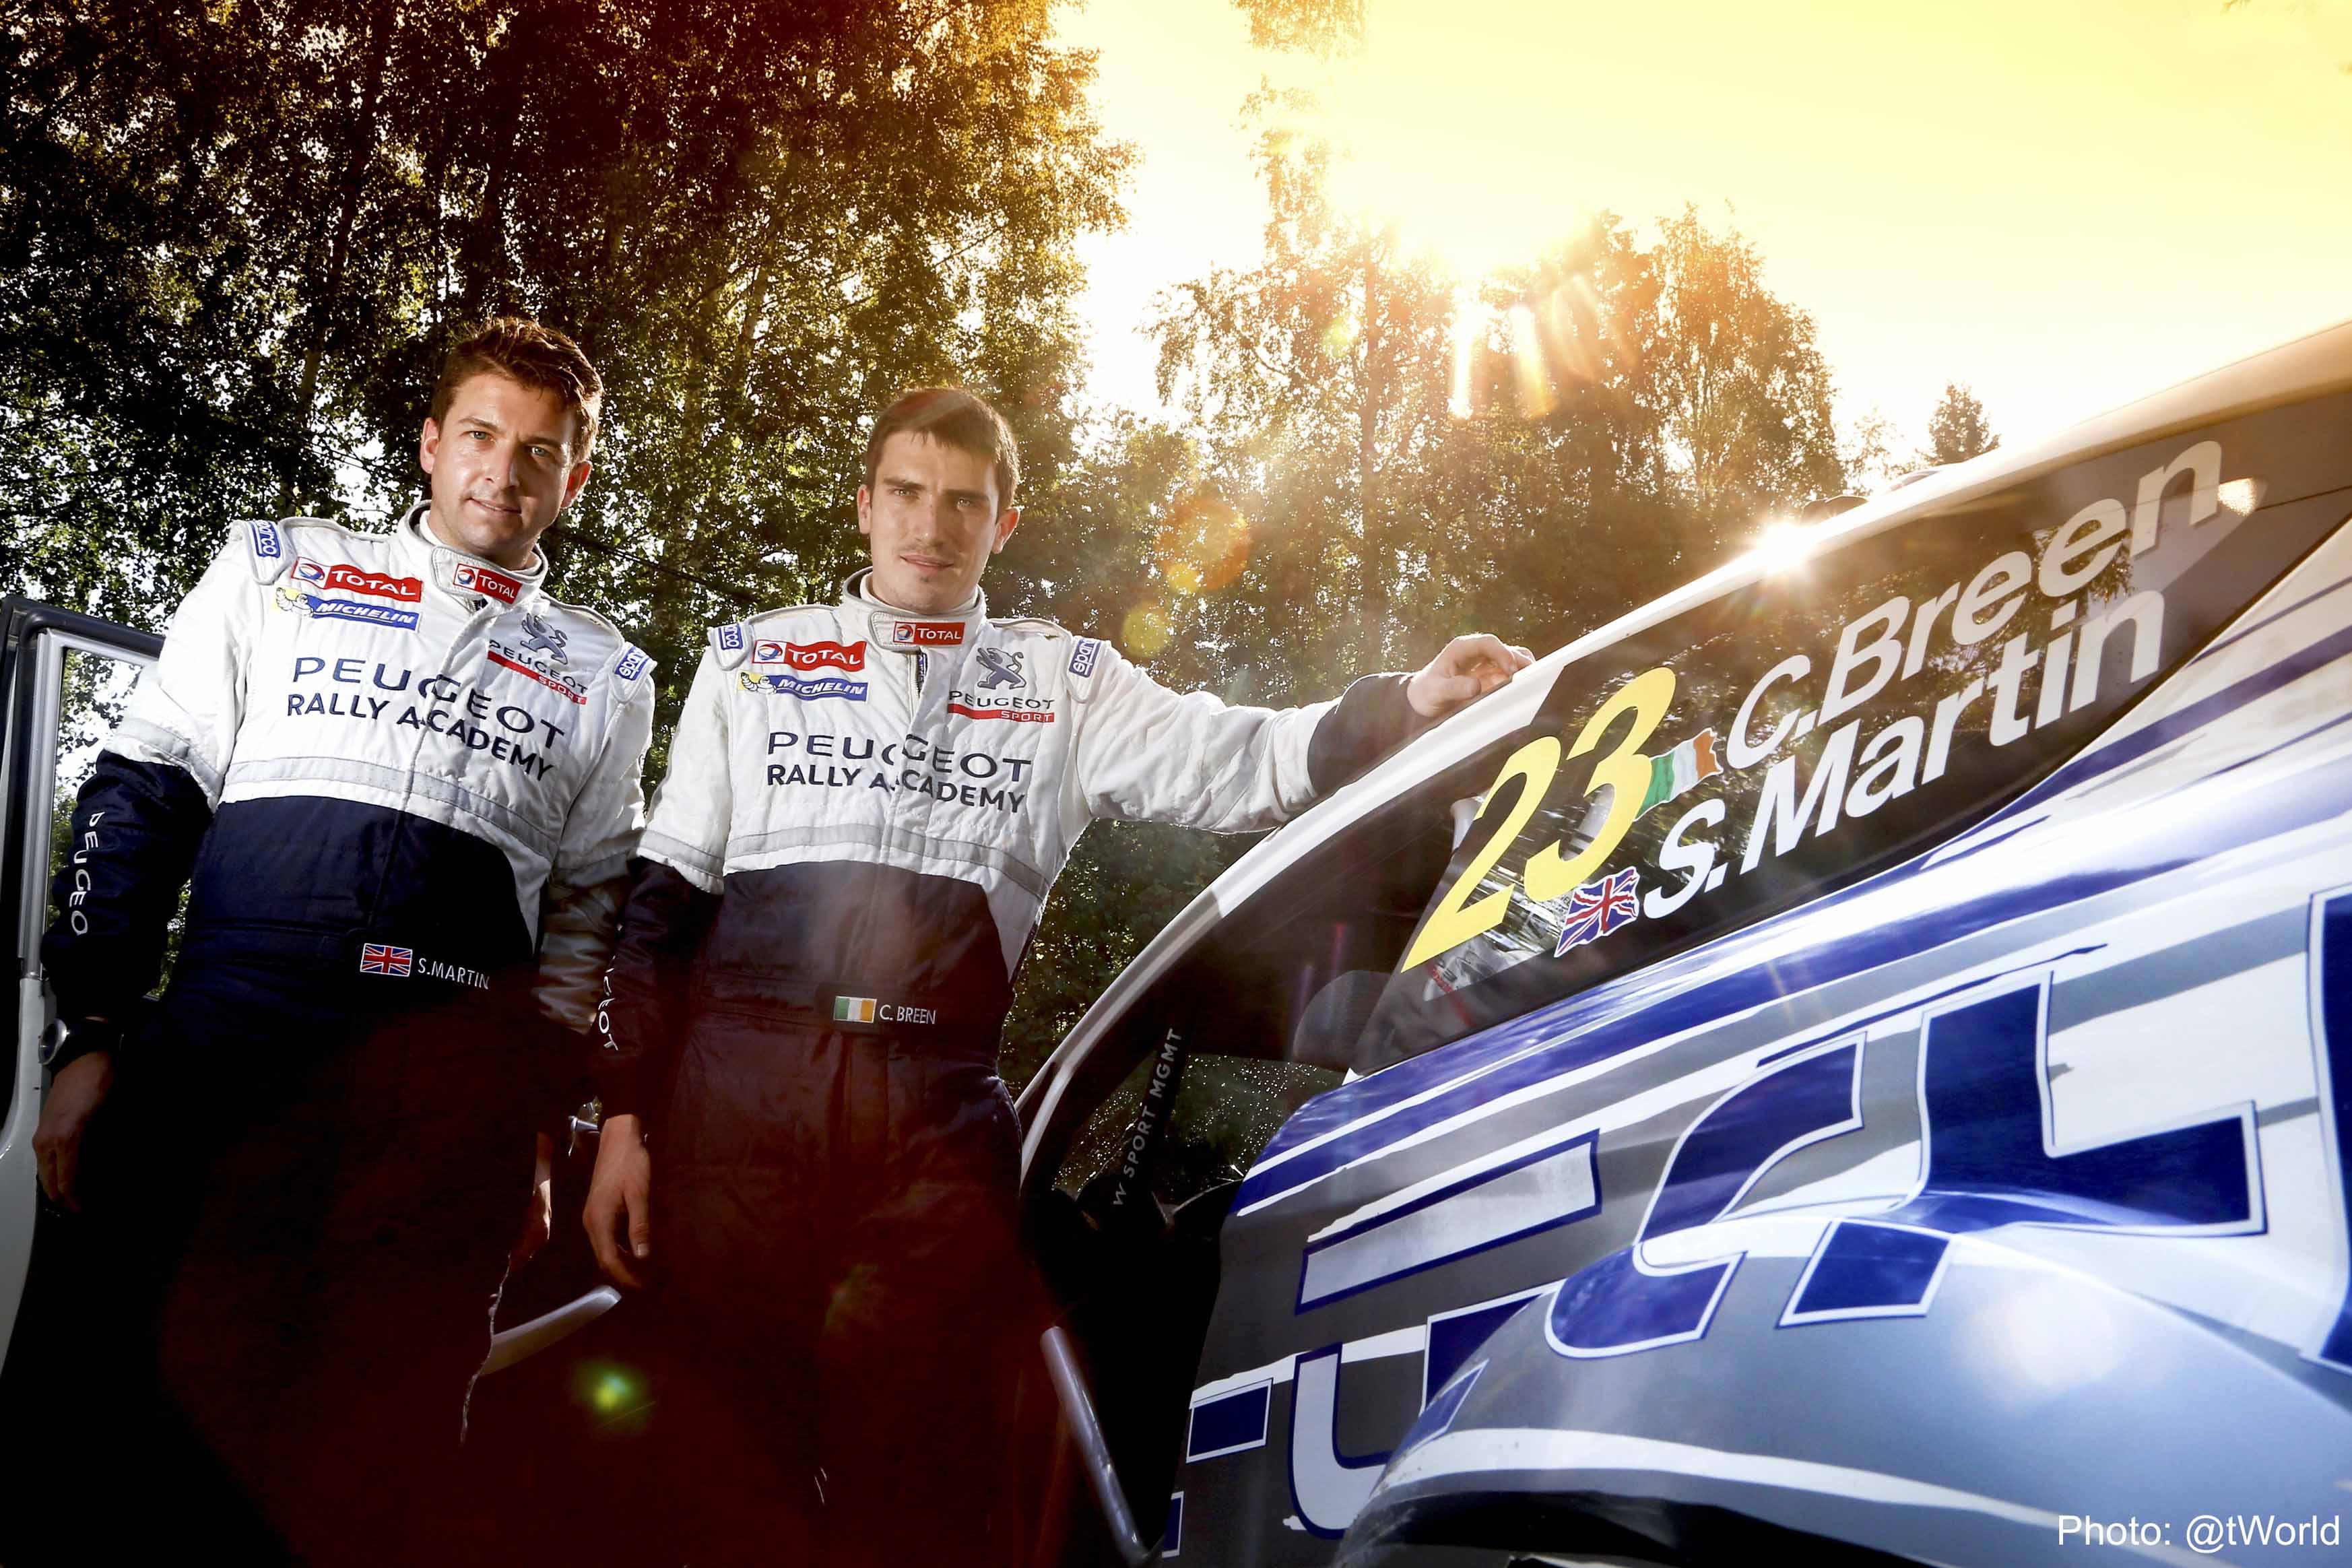 FIA WORLD RALLY CHAMPIONSHIP 2014 - FINLAND RALLY